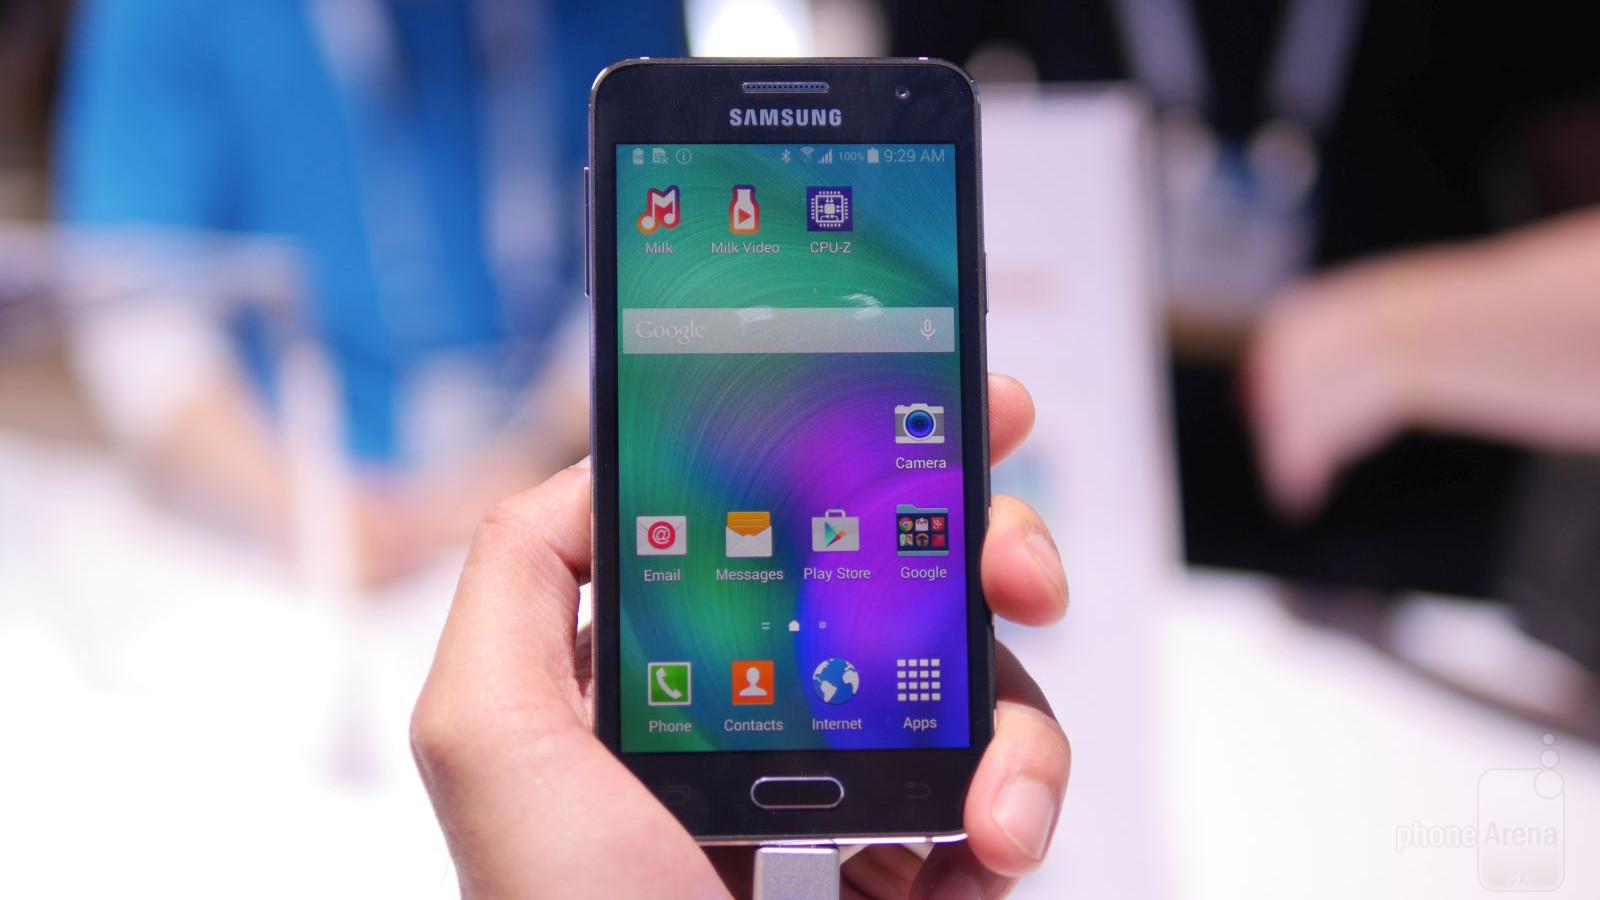 Best Phones between 10 and 15K in Kenya (July 2015)